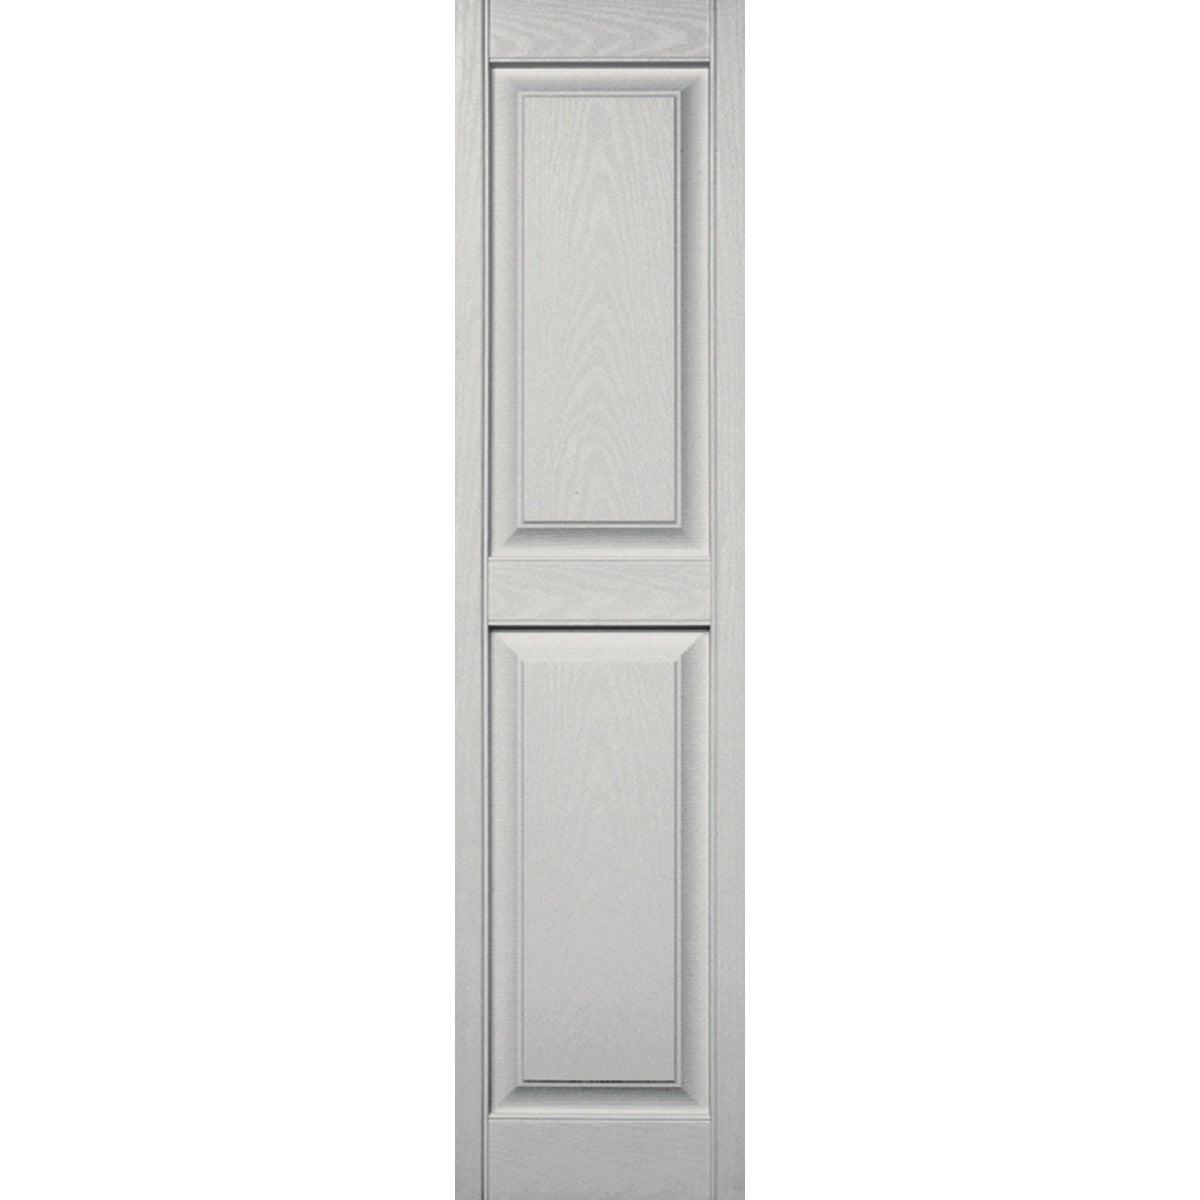 Builders Edge, Inc. 15X59 PBL PANEL SHUTTER 30140059030